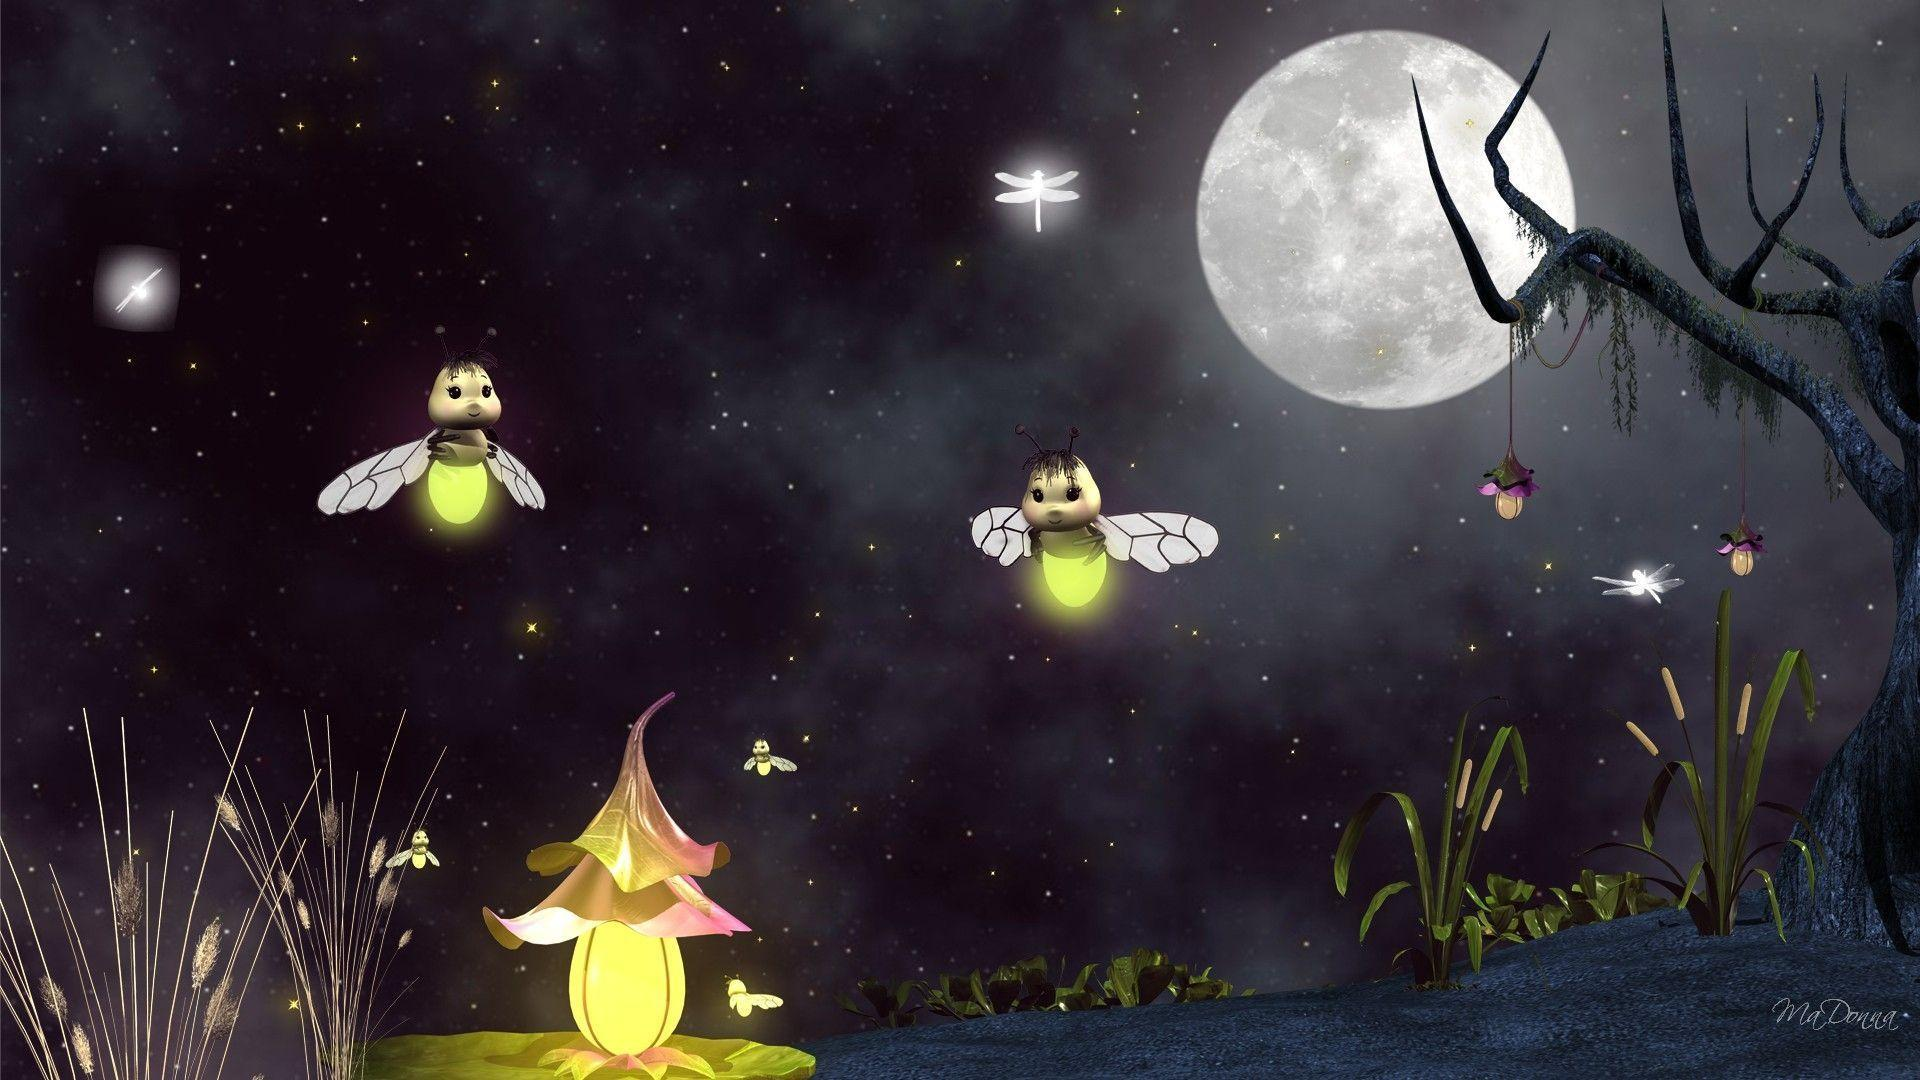 Fireflies and Dragonflies : Desktop and mobile wallpaper : Wallippo